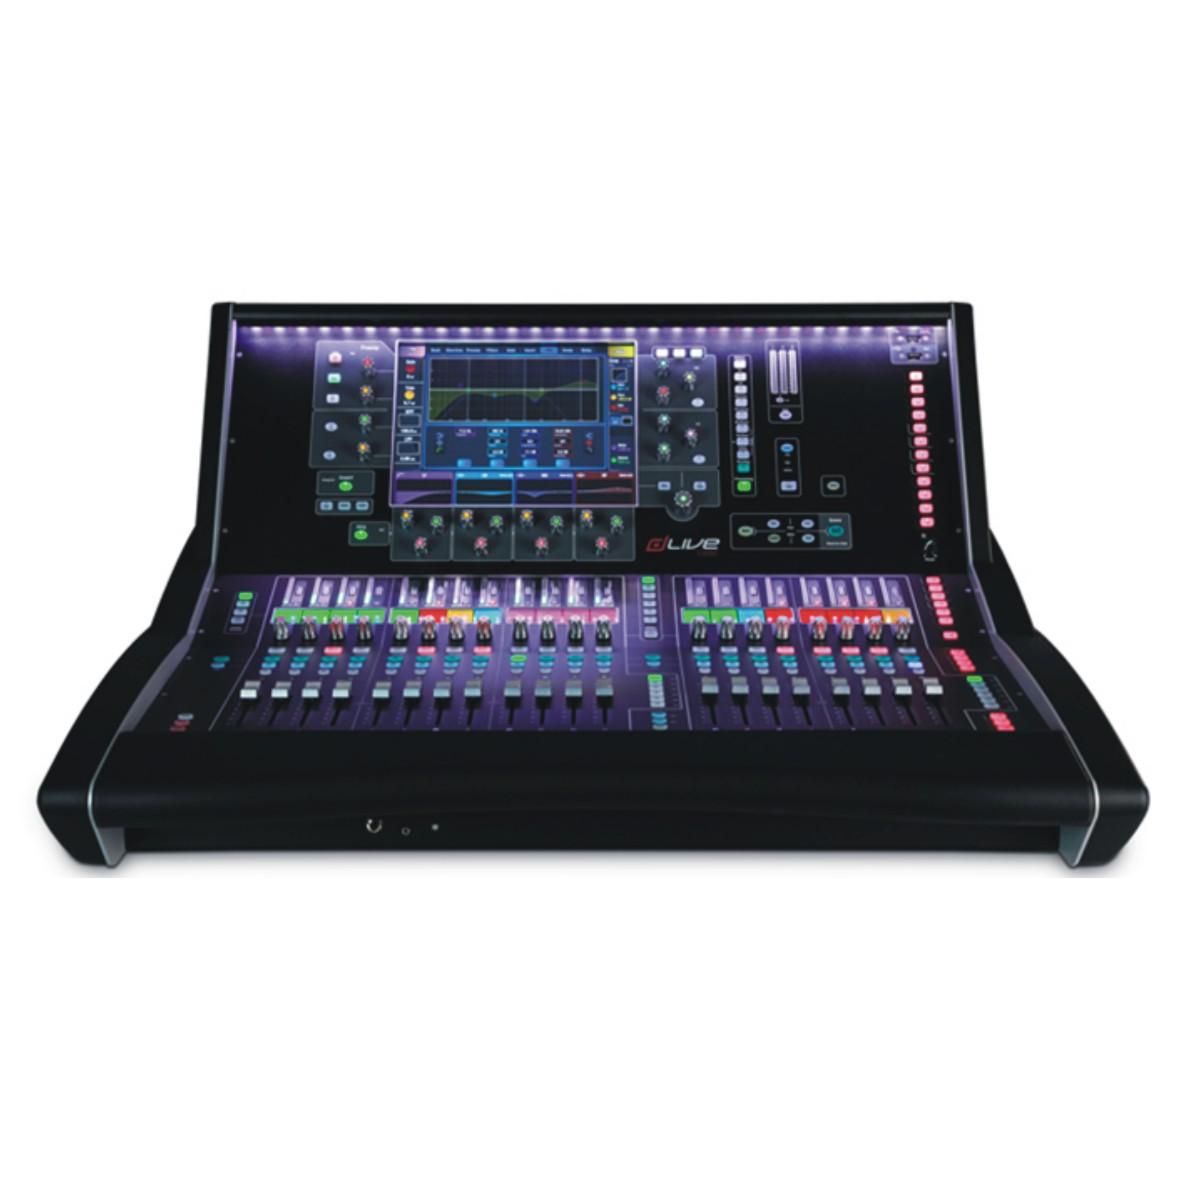 dLive S3000 数字调音台